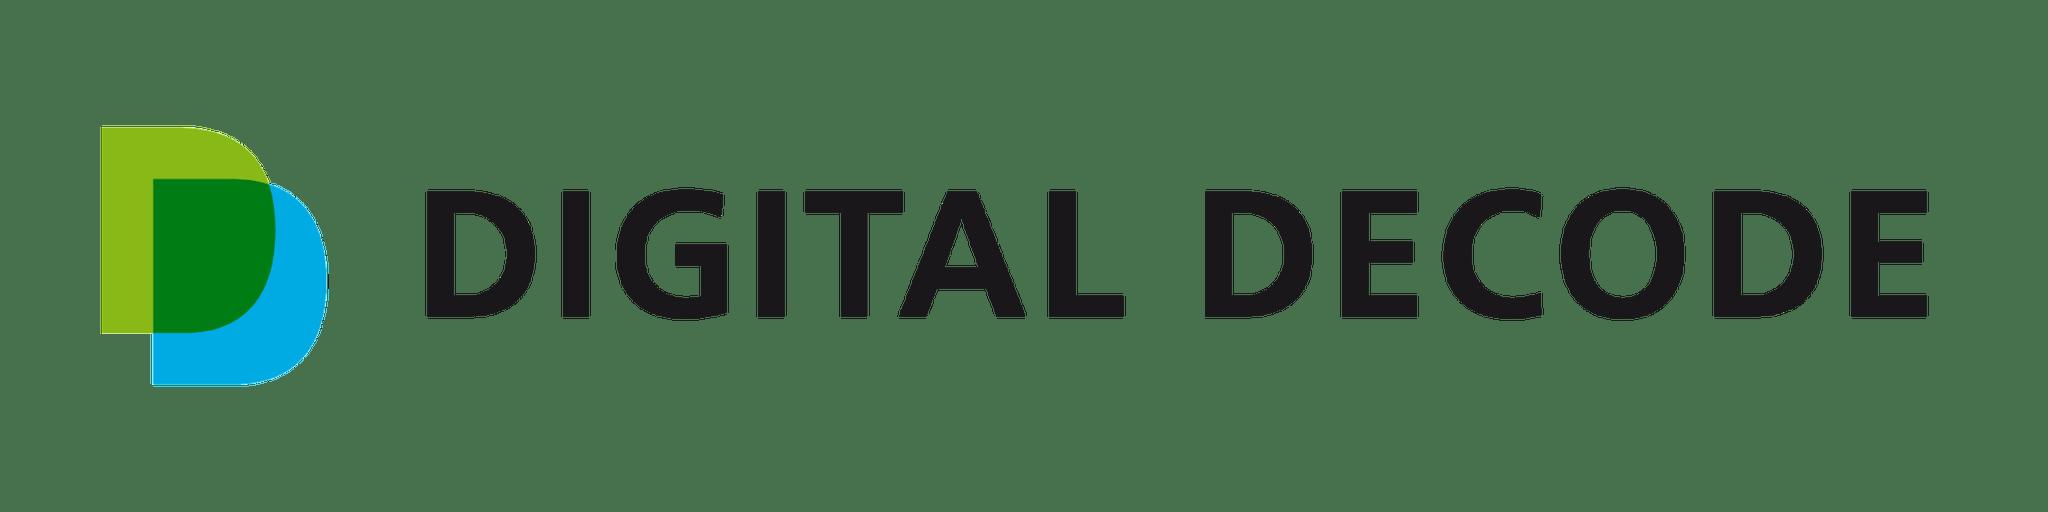 Digital Dino